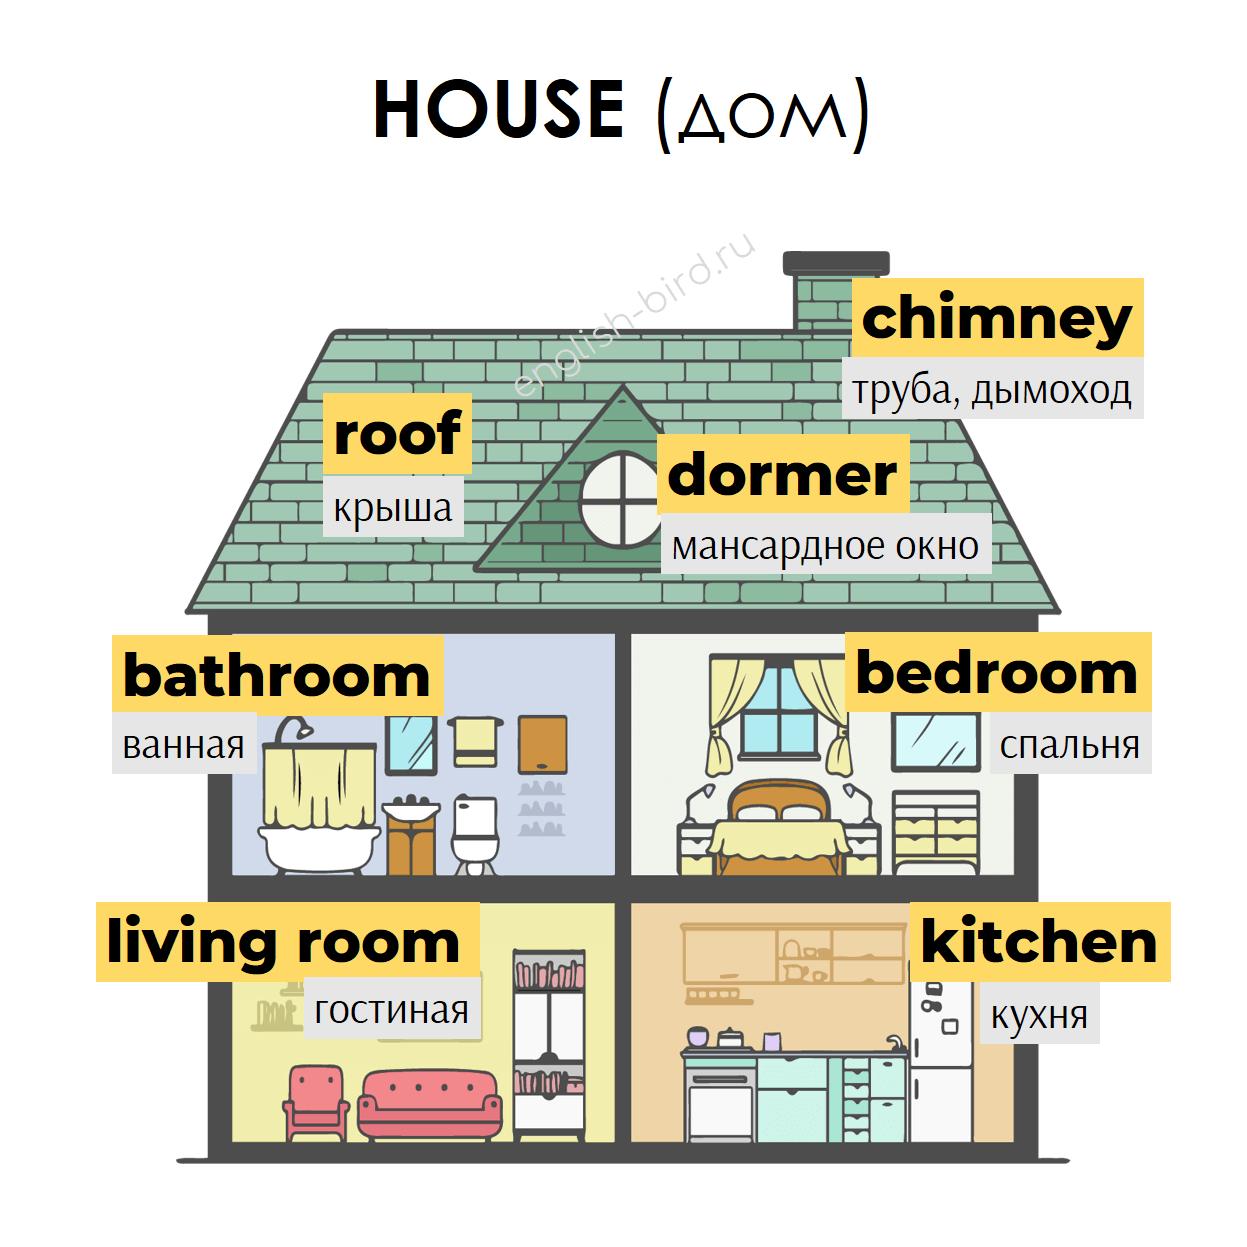 Дом на английском: части дома